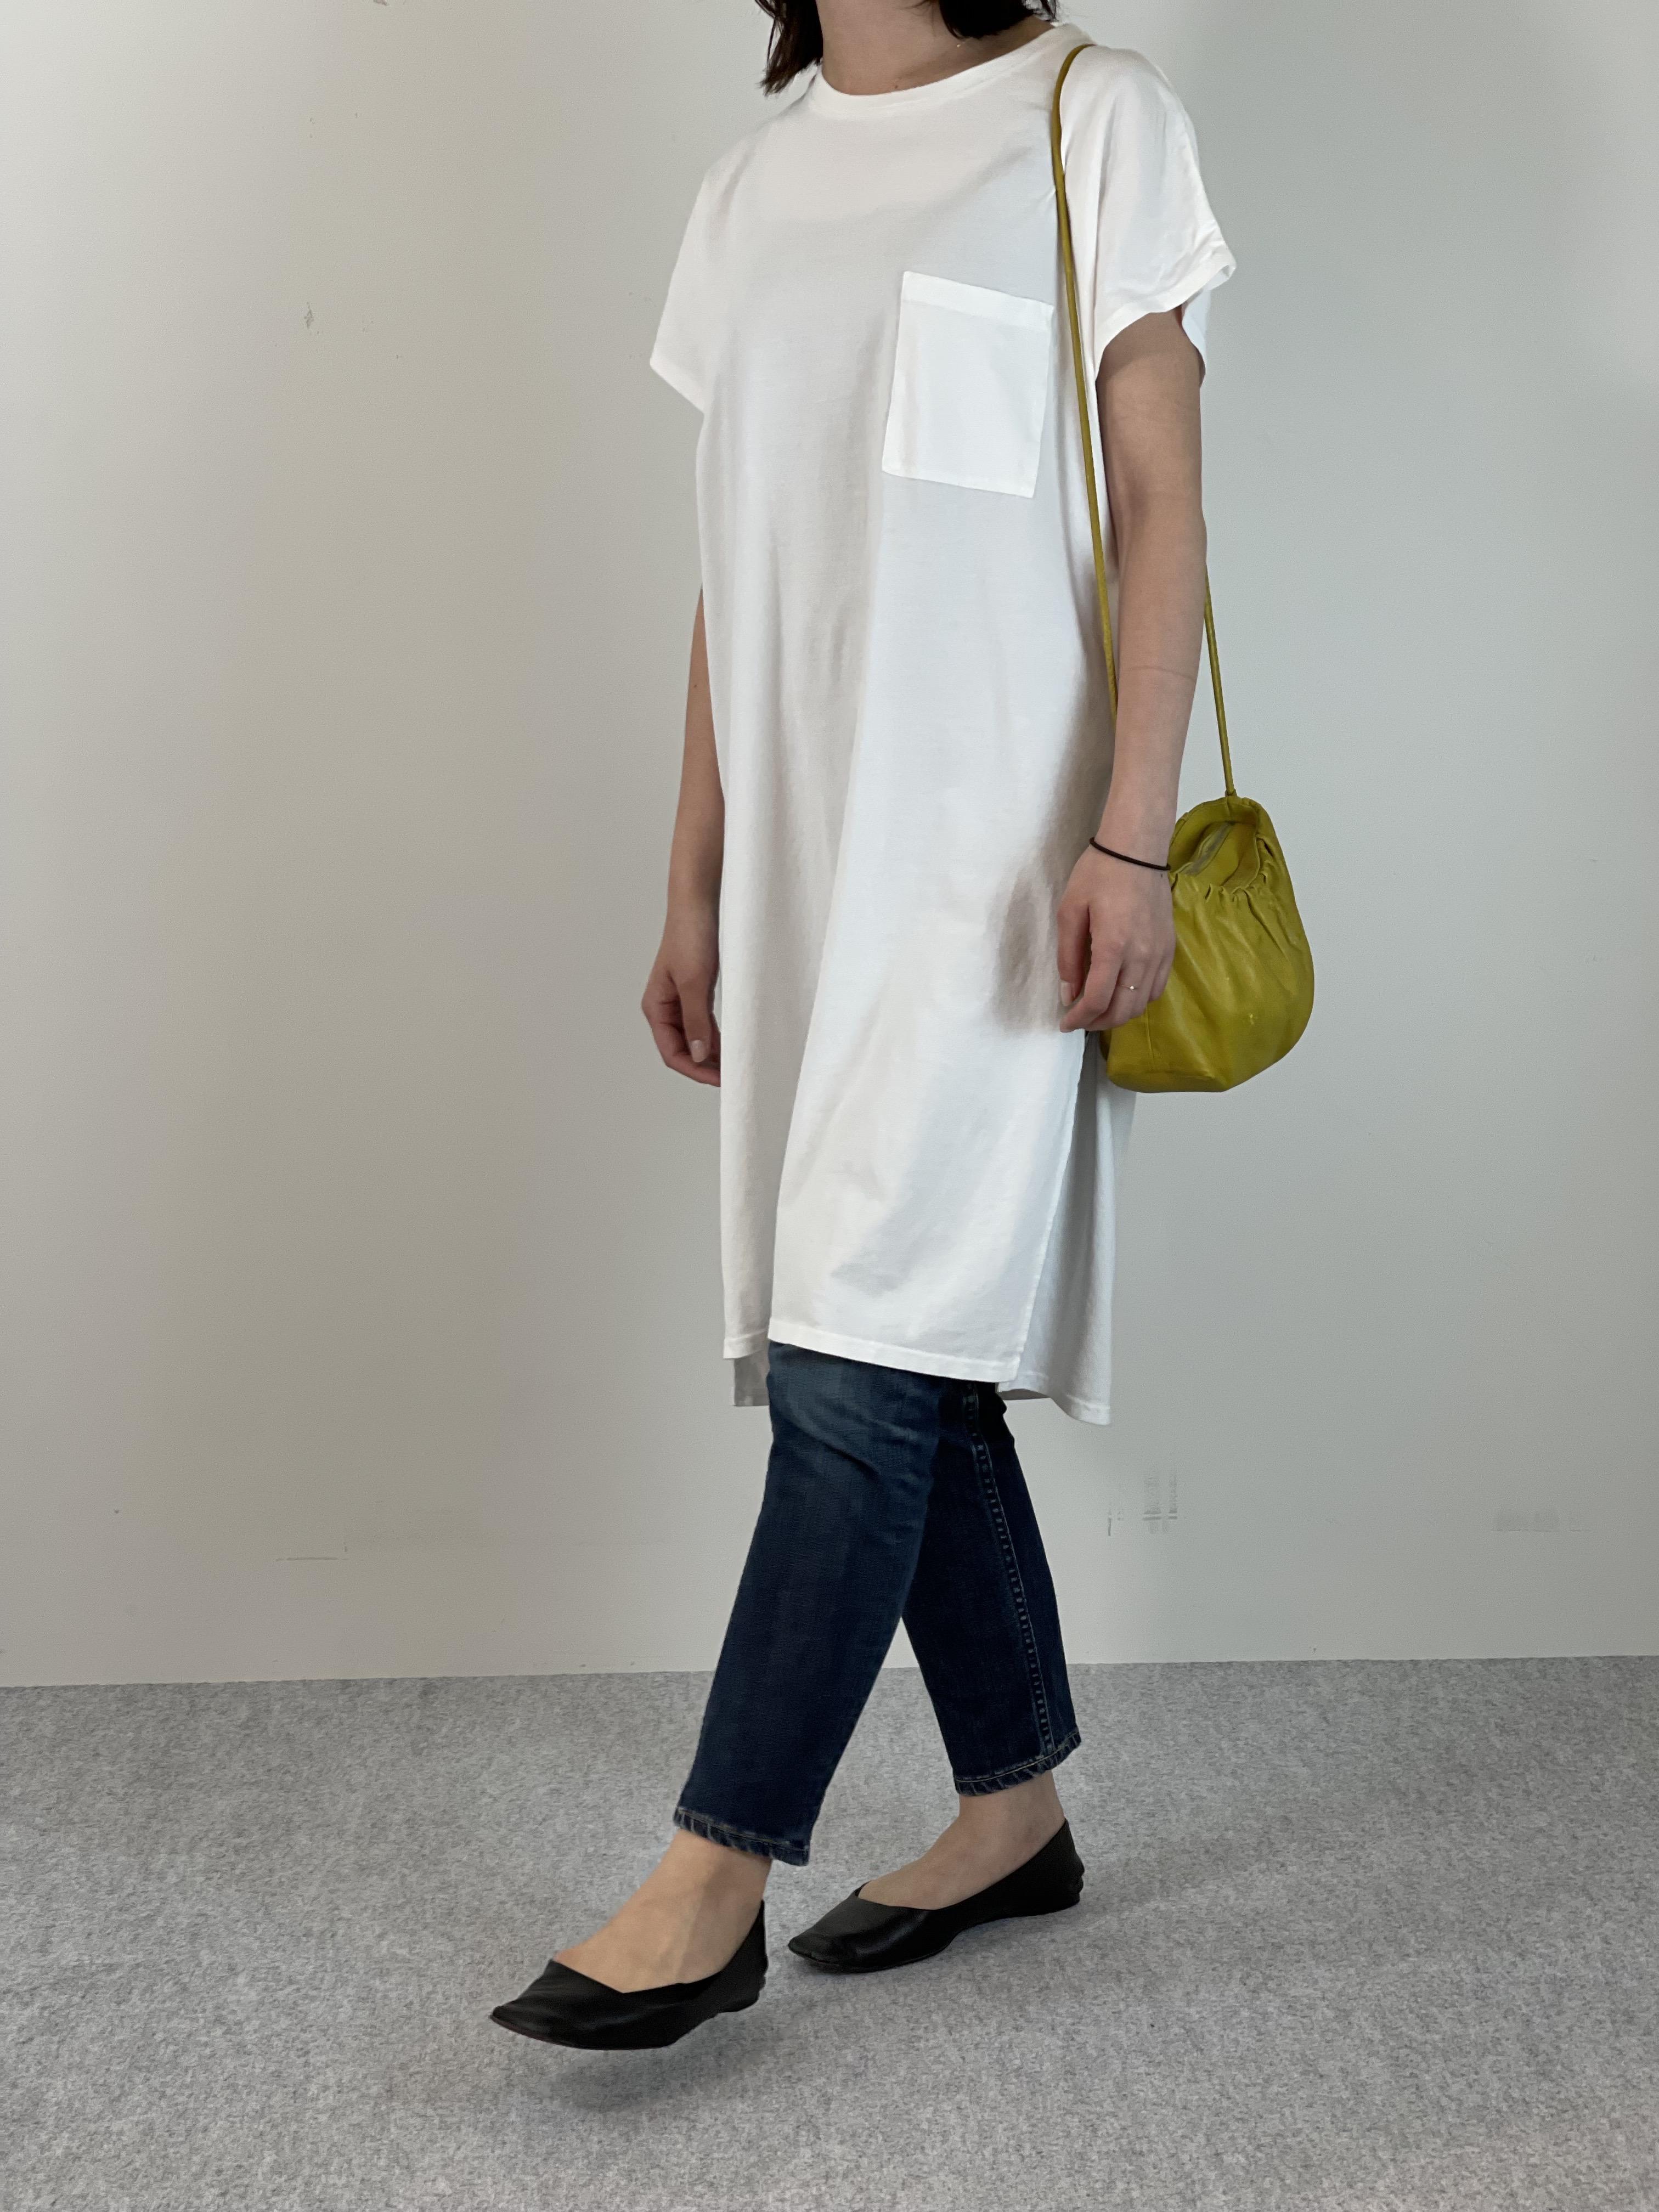 Women's COMFORT DRESS TUNIC T-SHIRTの着用画像3